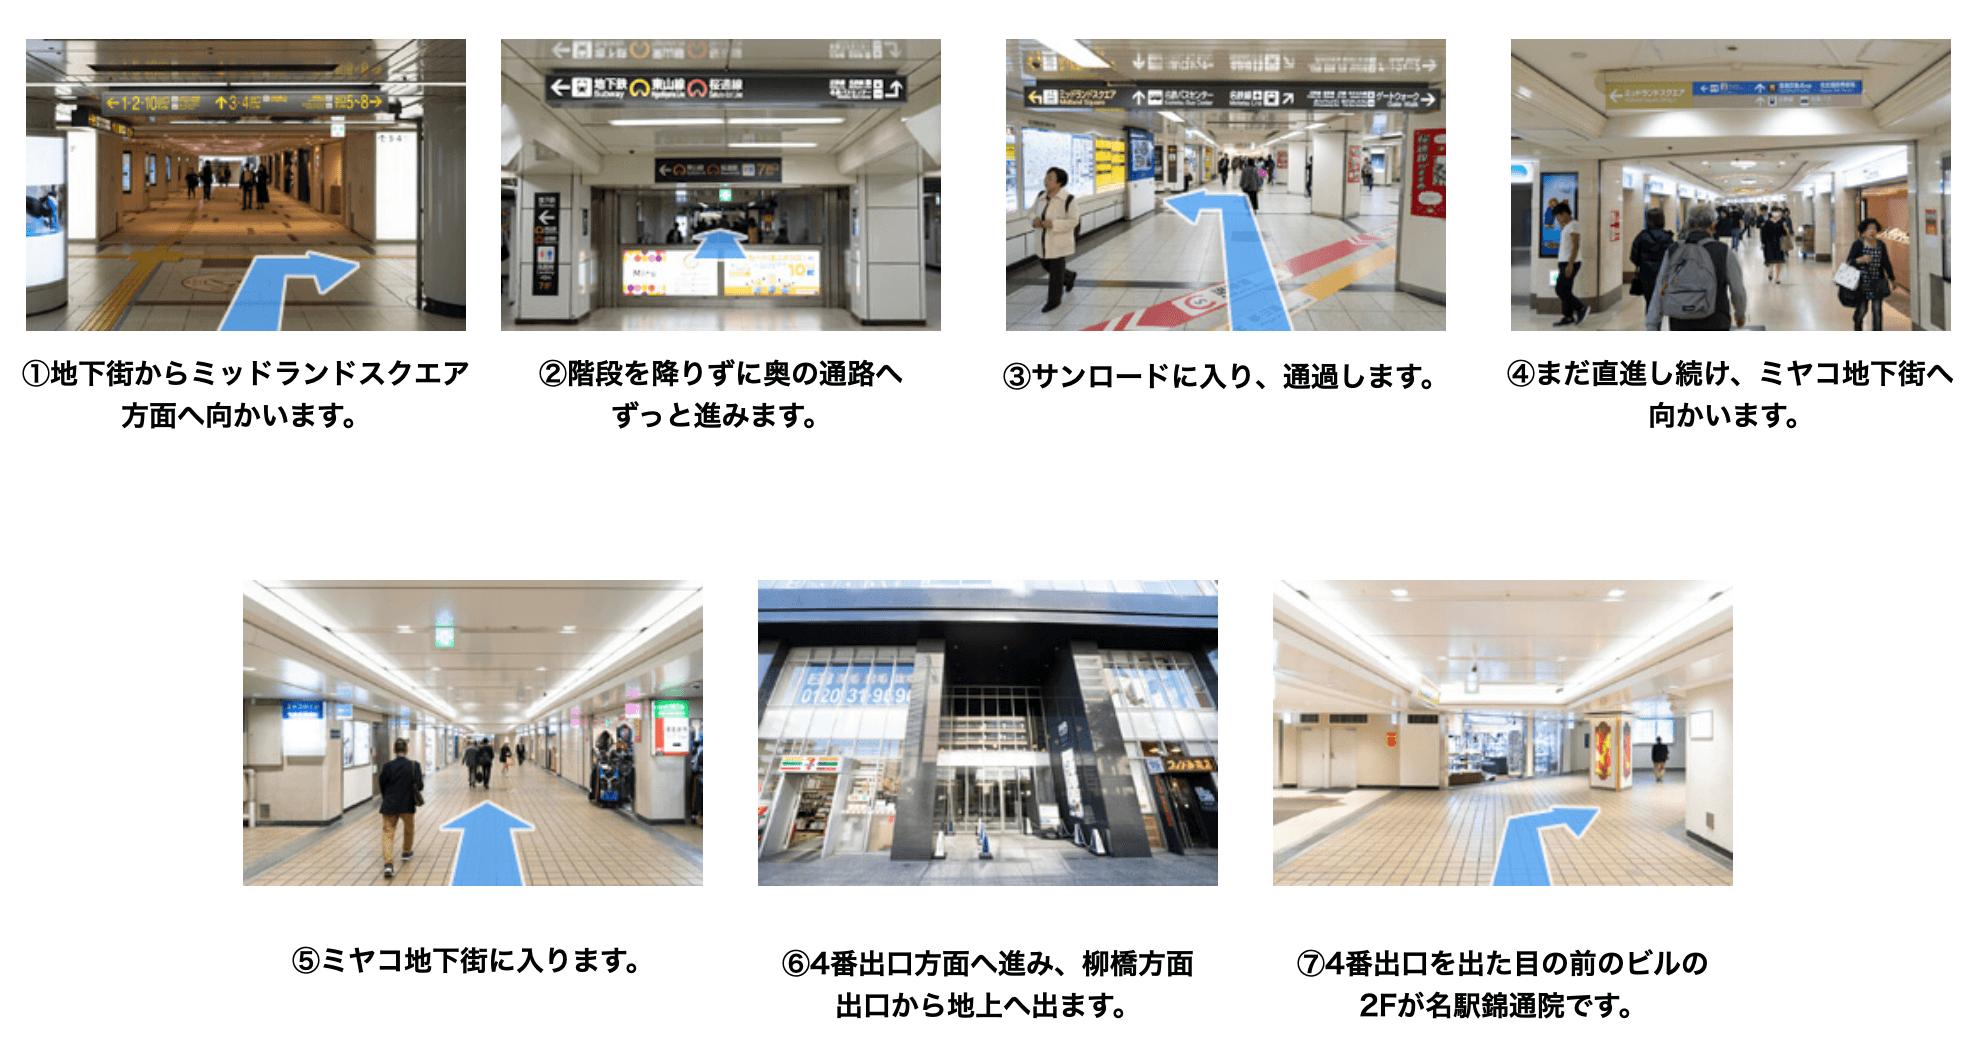 AGAスキンクリニック名駅錦通院までのアクセス方法